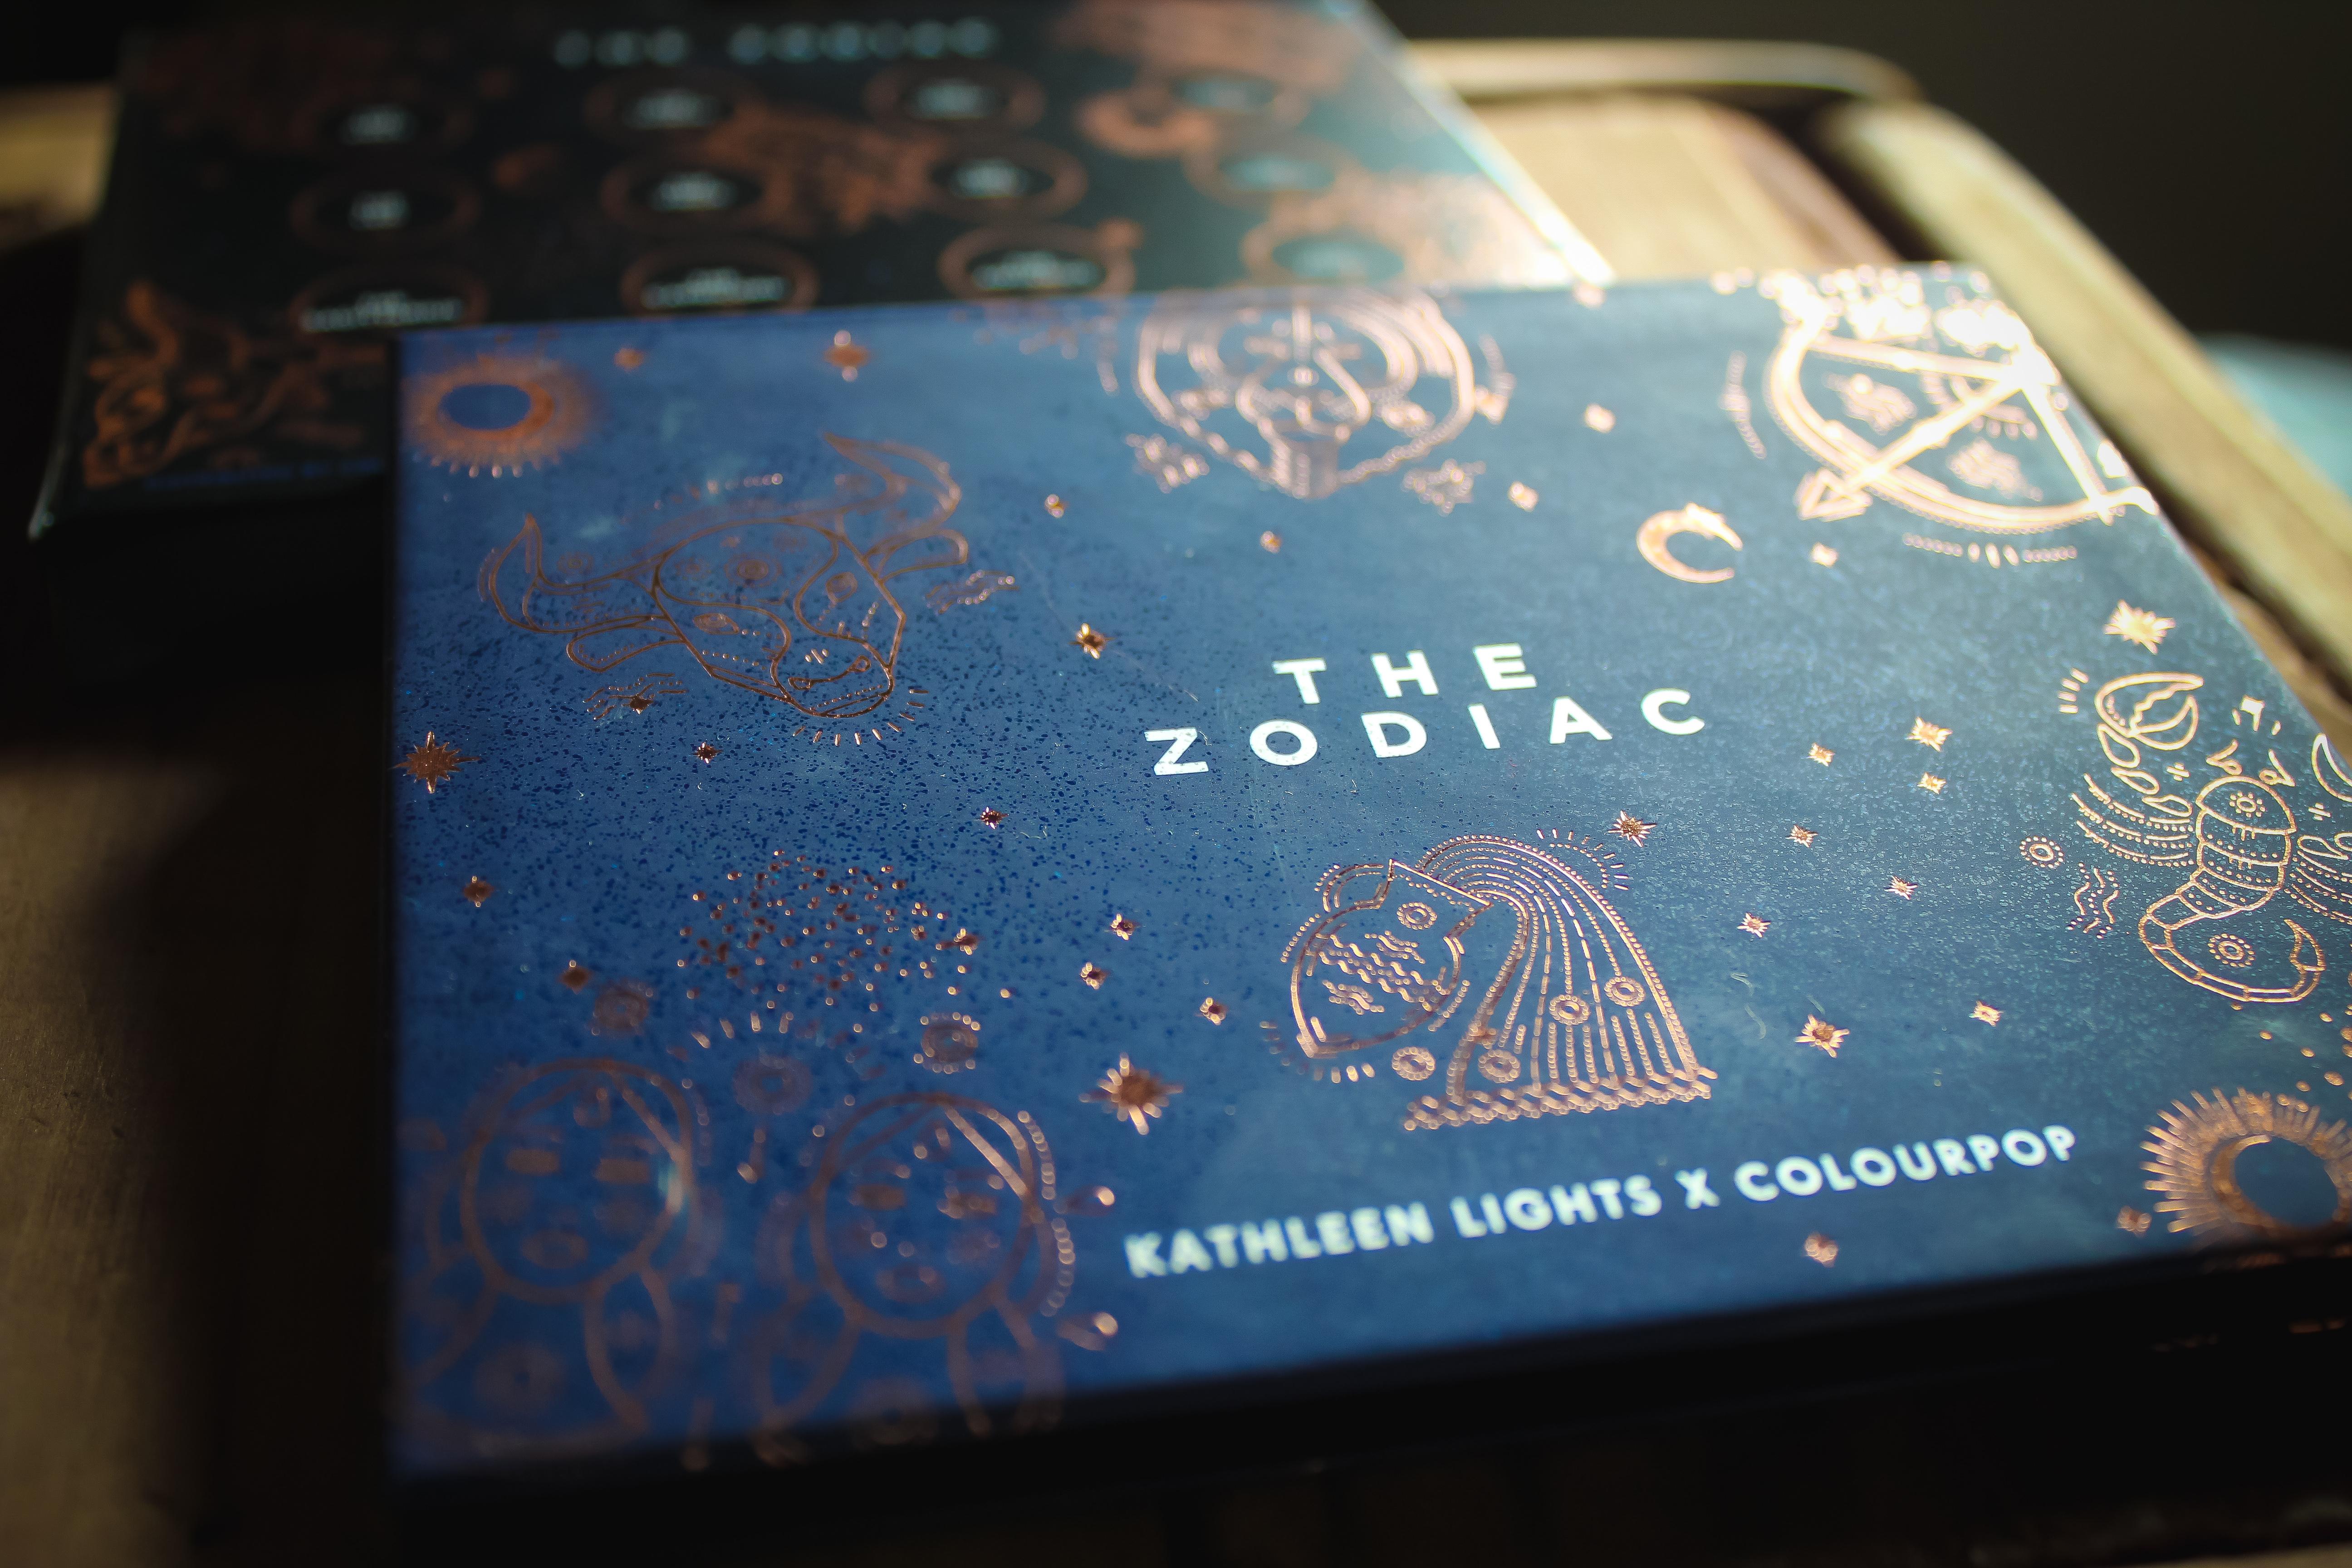 ColourPop x Kathleen Lights The Zodiac Palette